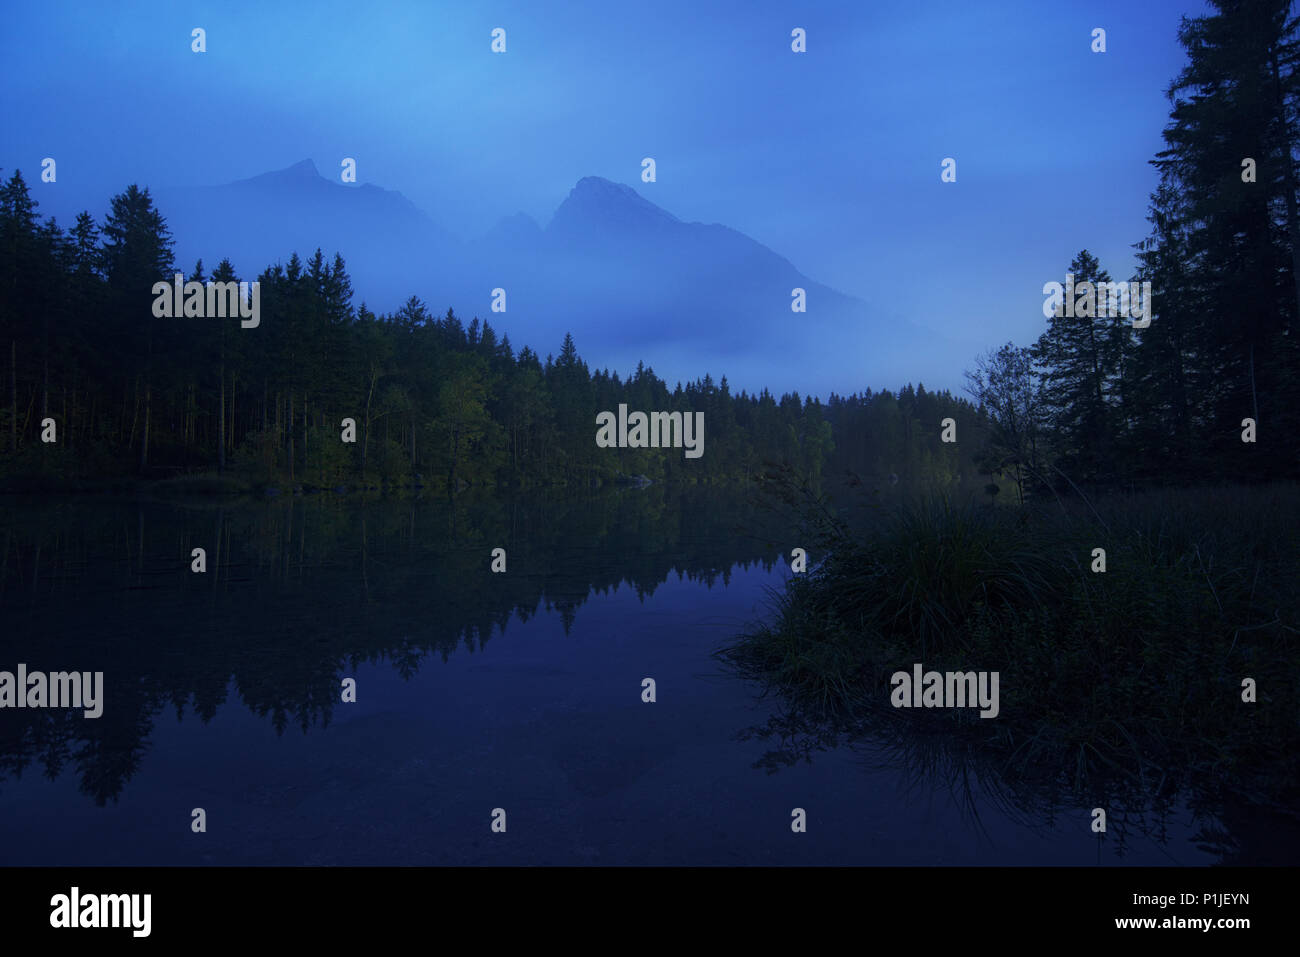 Hochkalter massif at blue hour, Hintersee, Berchtesgaden, Bavaria, Germany Stock Photo